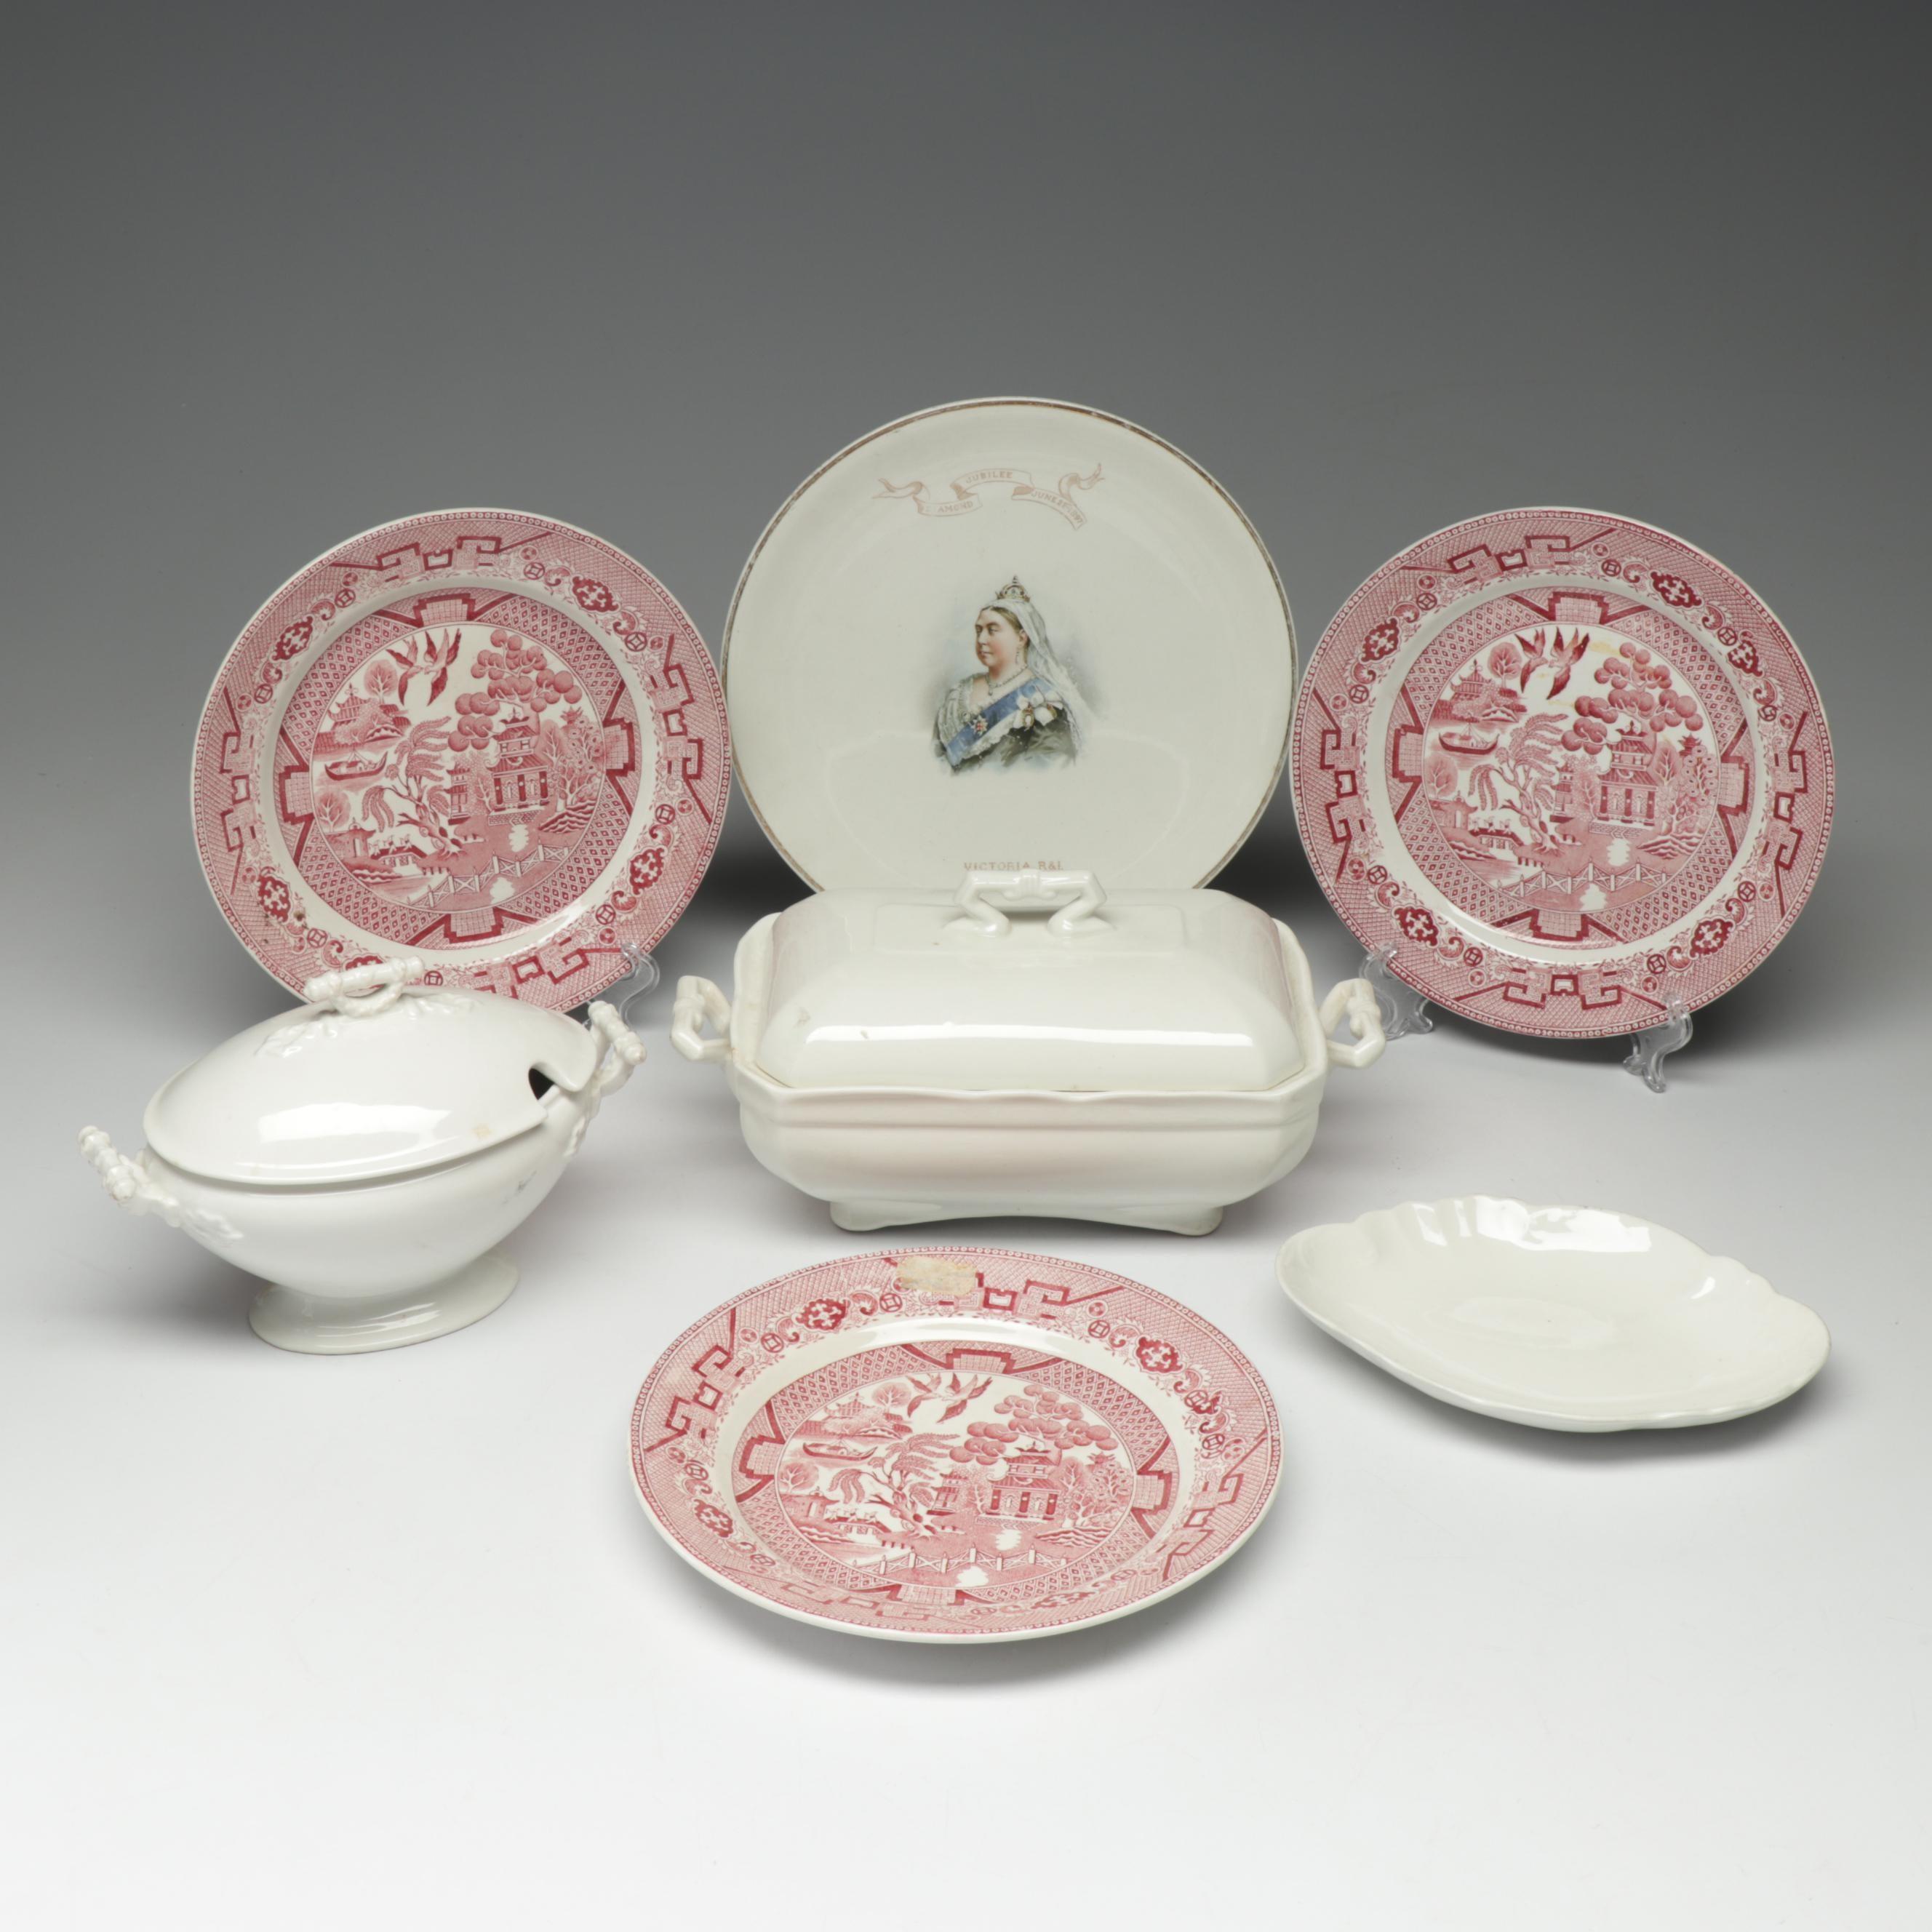 Johnson Bros, John Maddock & Sons and Société Céramique Porcelain Tableware